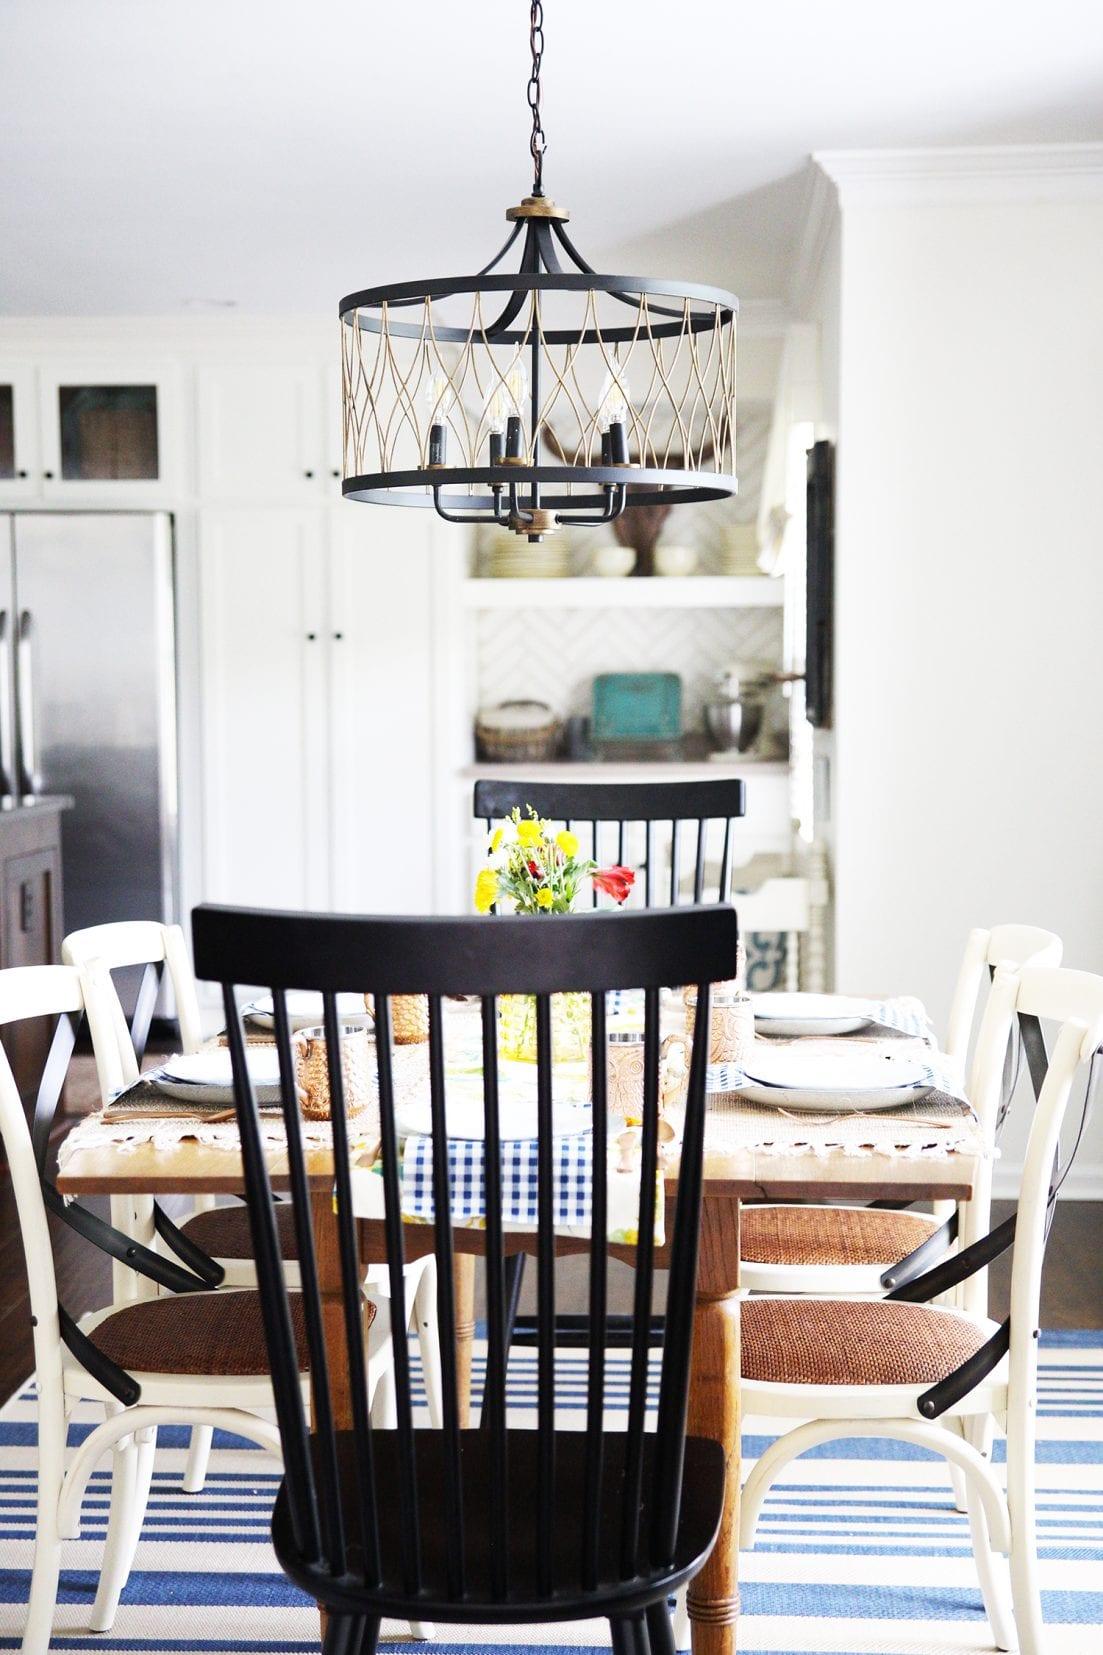 10 foolproof decorating tips - lighting